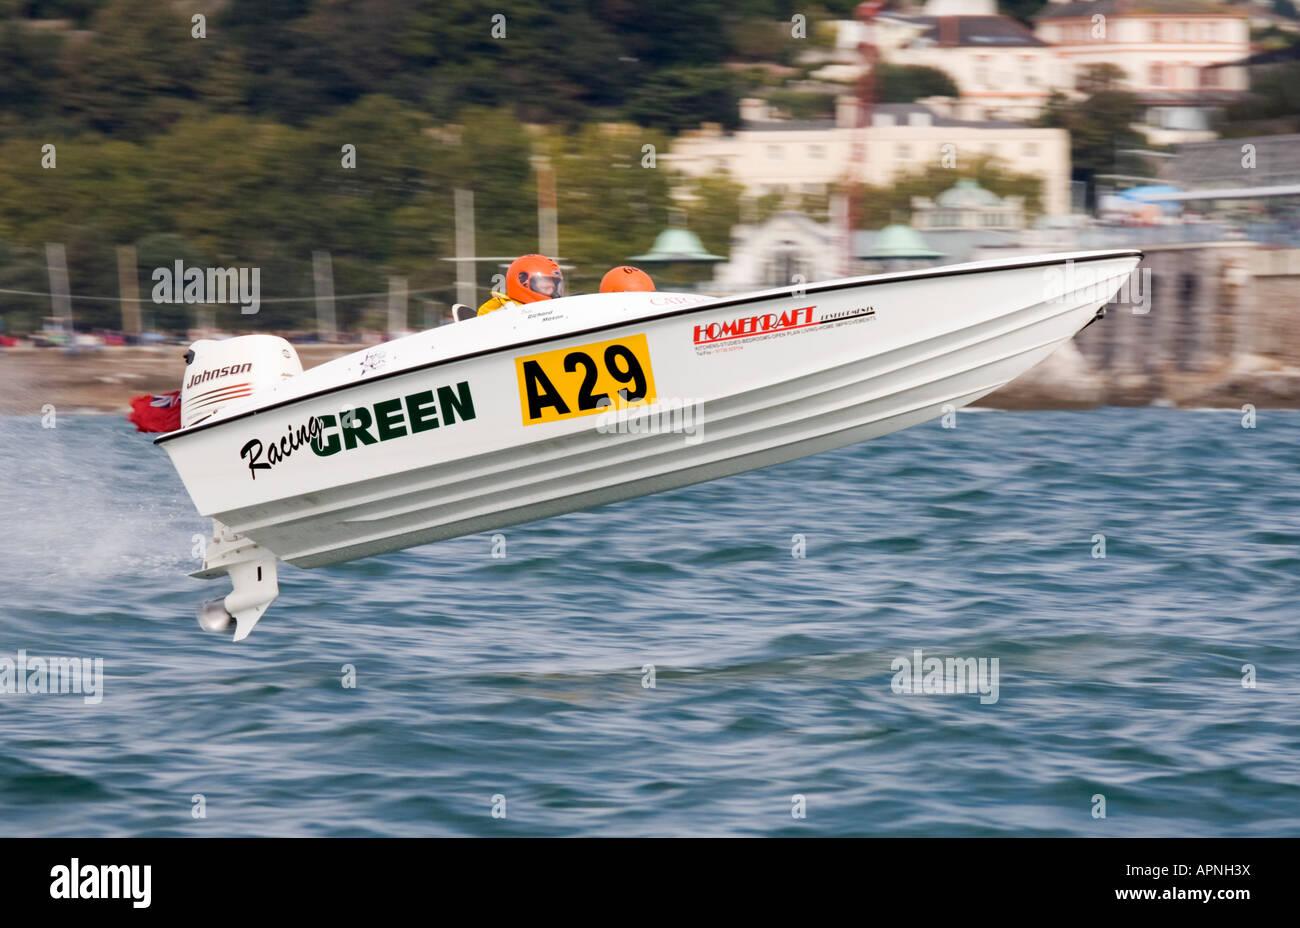 Offshore circuit racing Racing Green No. A29 Racing at Torquay England - Stock Image